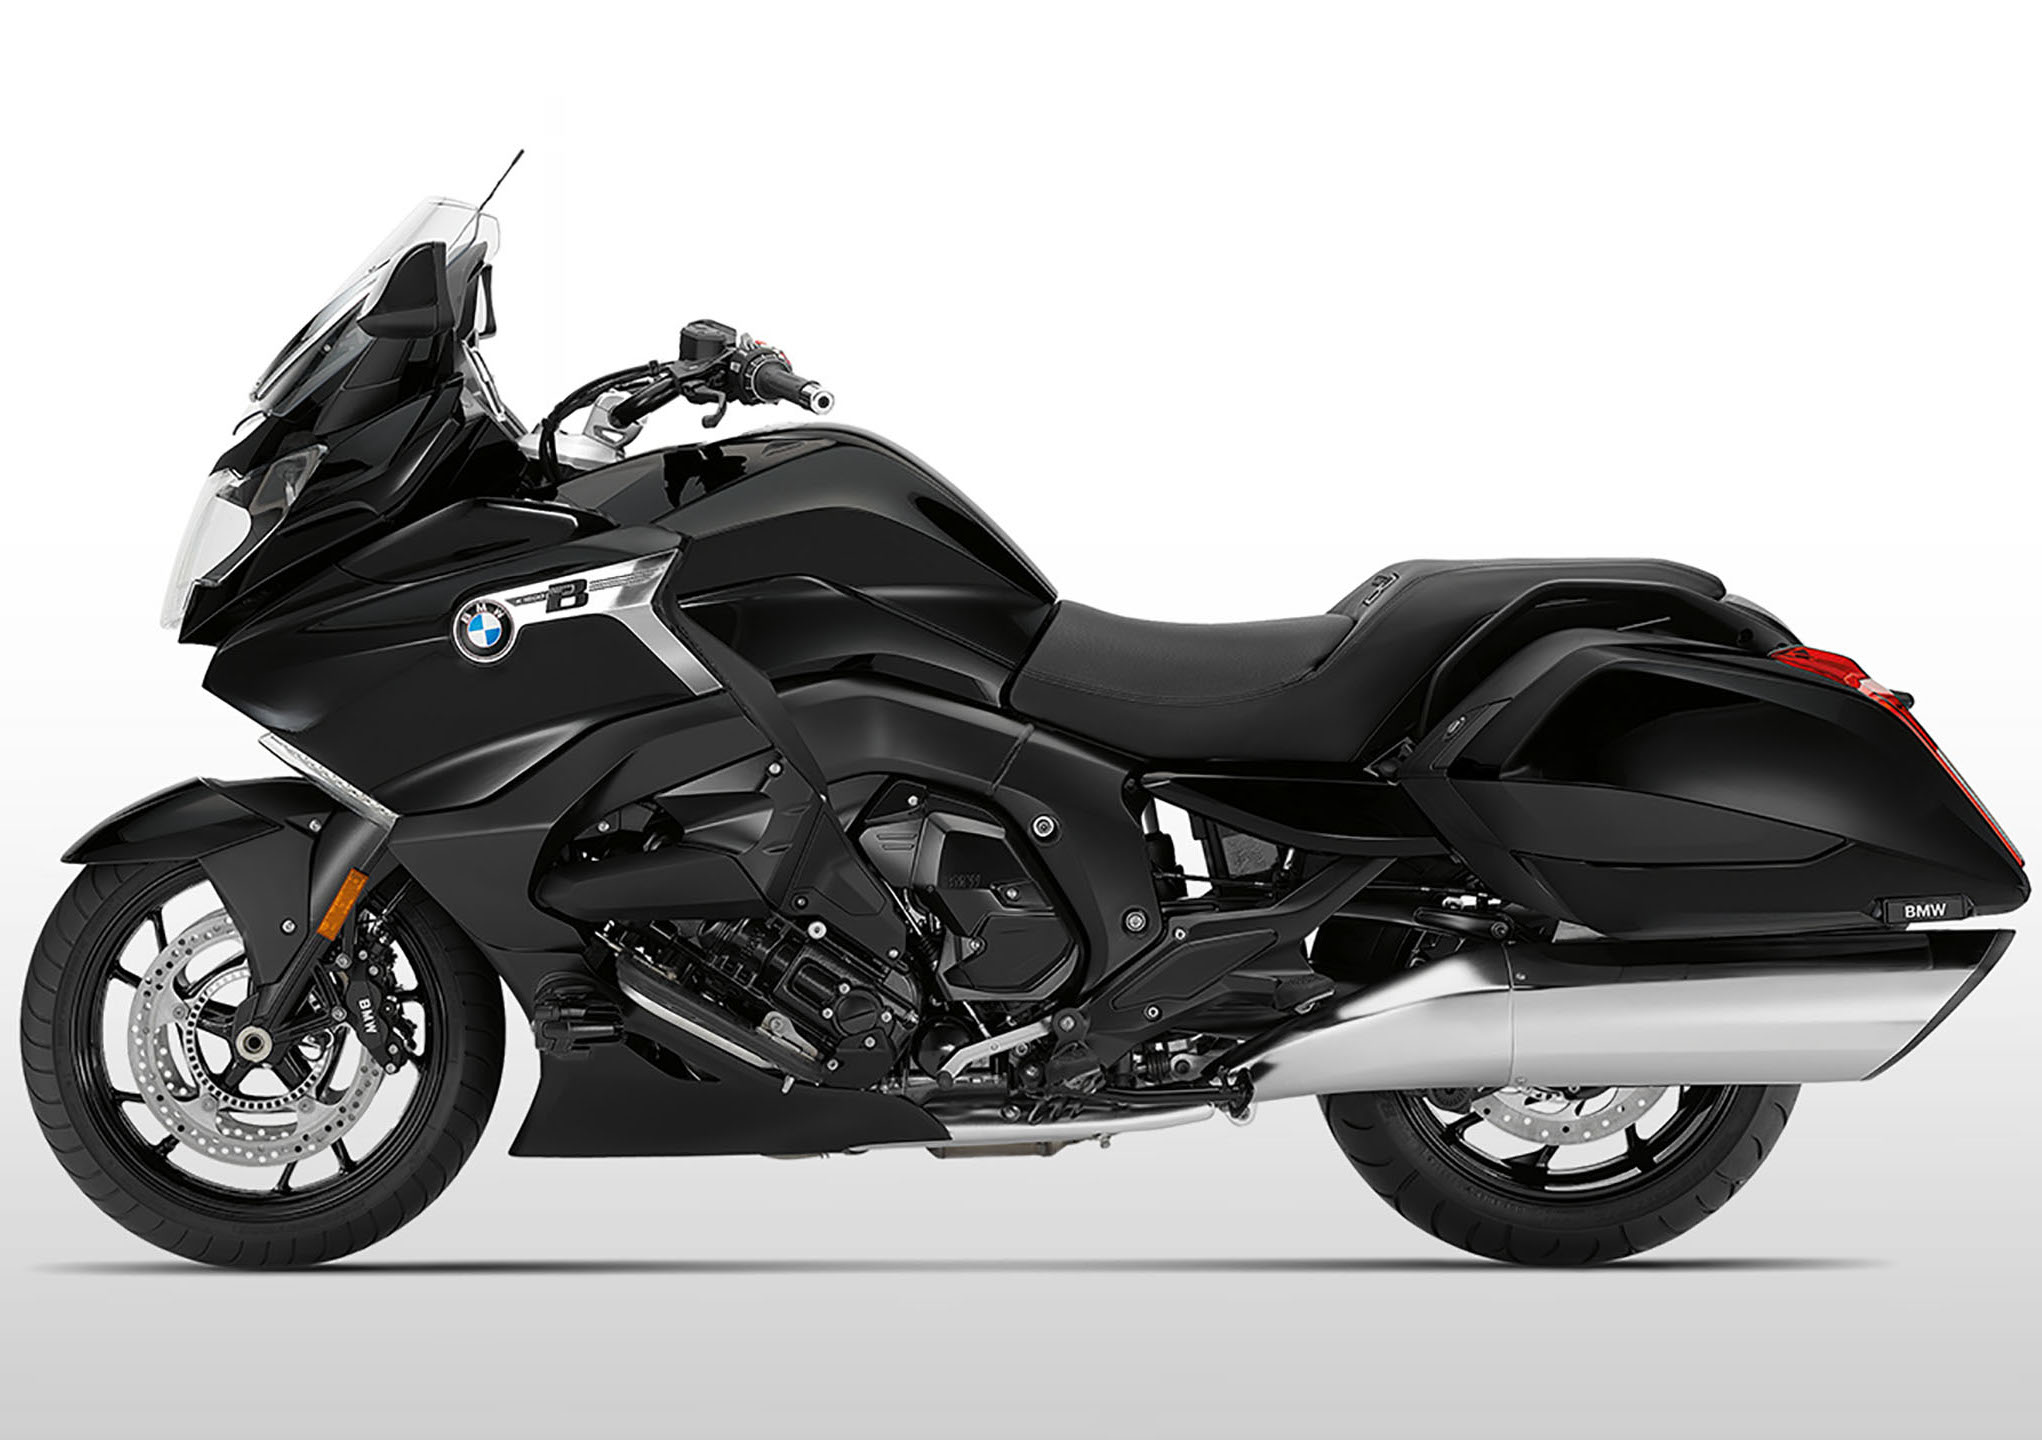 bmw-motorrad-k-1600-b